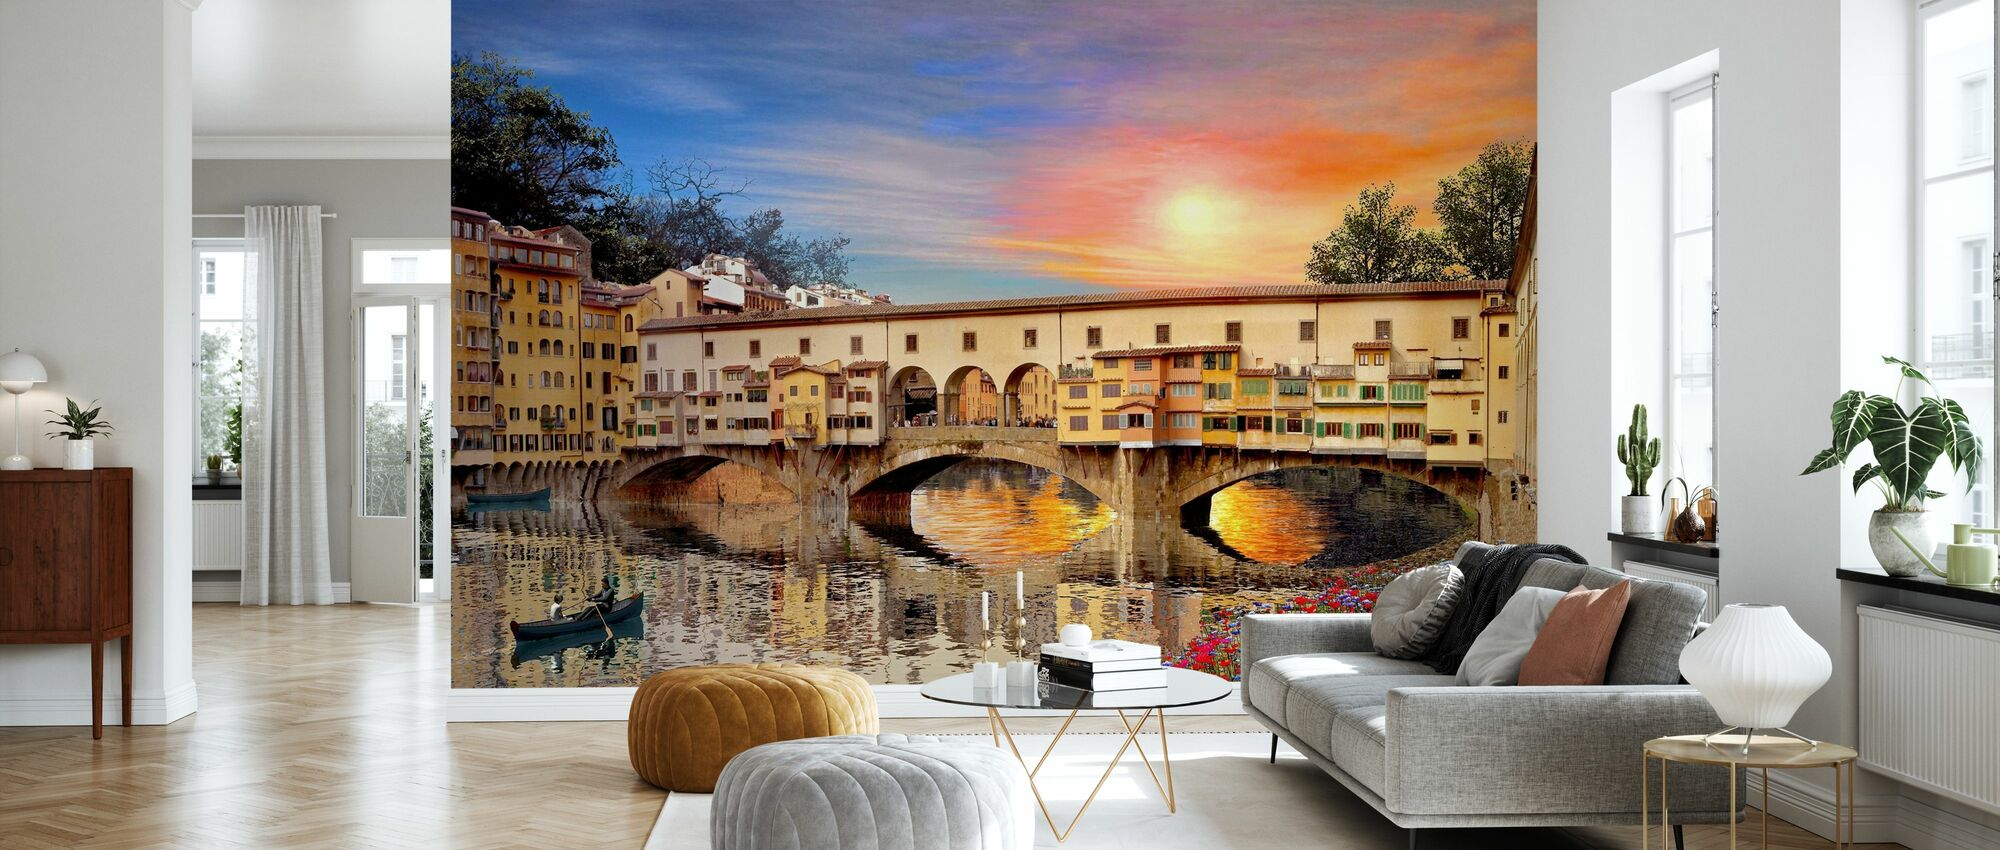 Firenze Bro - Tapet - Stue